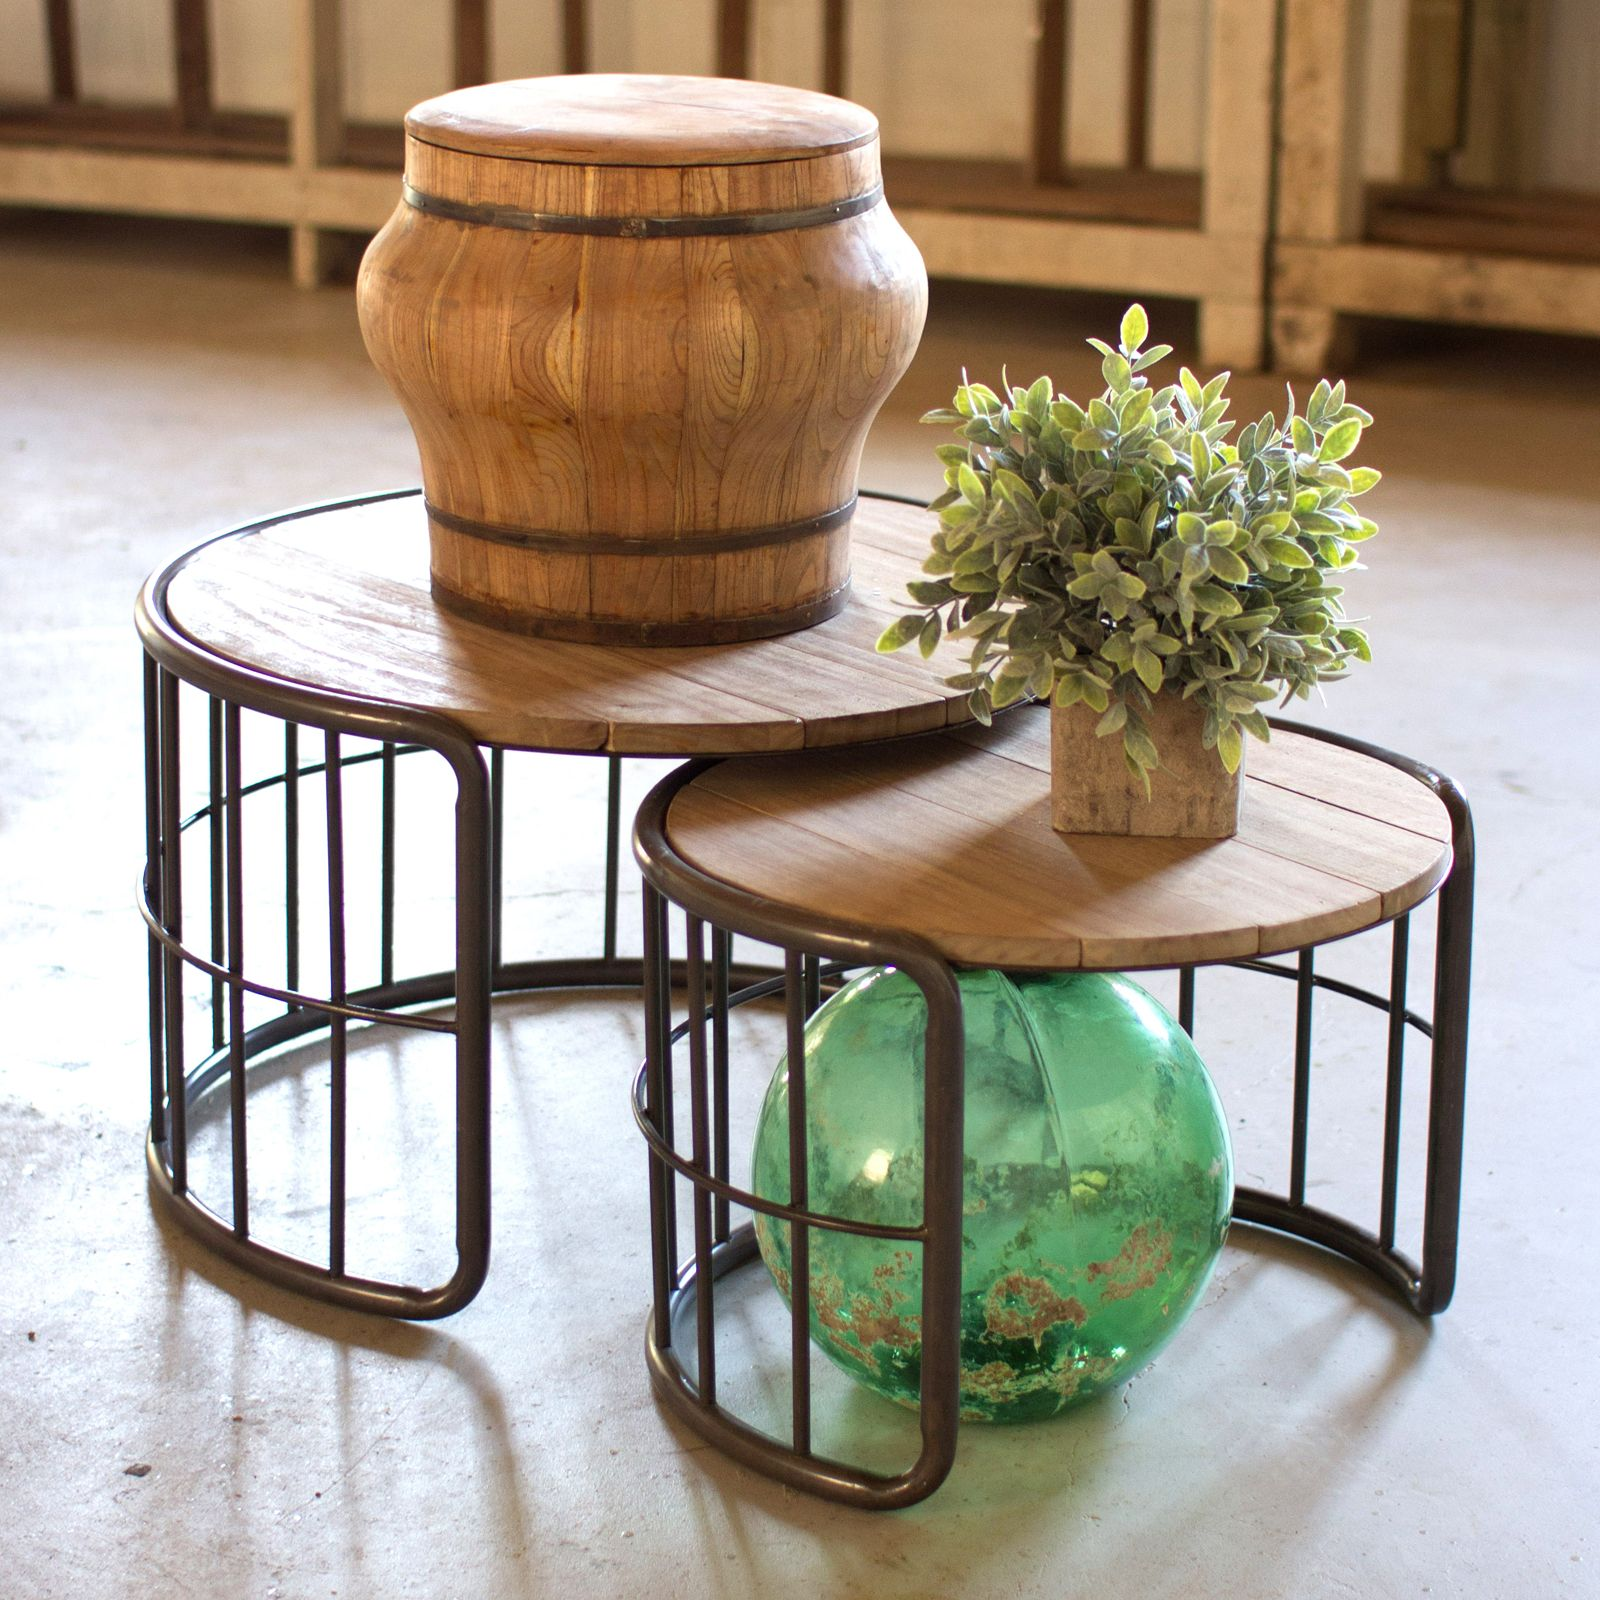 Farmer S Barrels Nesting Tables Set Of 2 Coffee Table Nesting Coffee Tables Round Coffee Table [ 1600 x 1600 Pixel ]